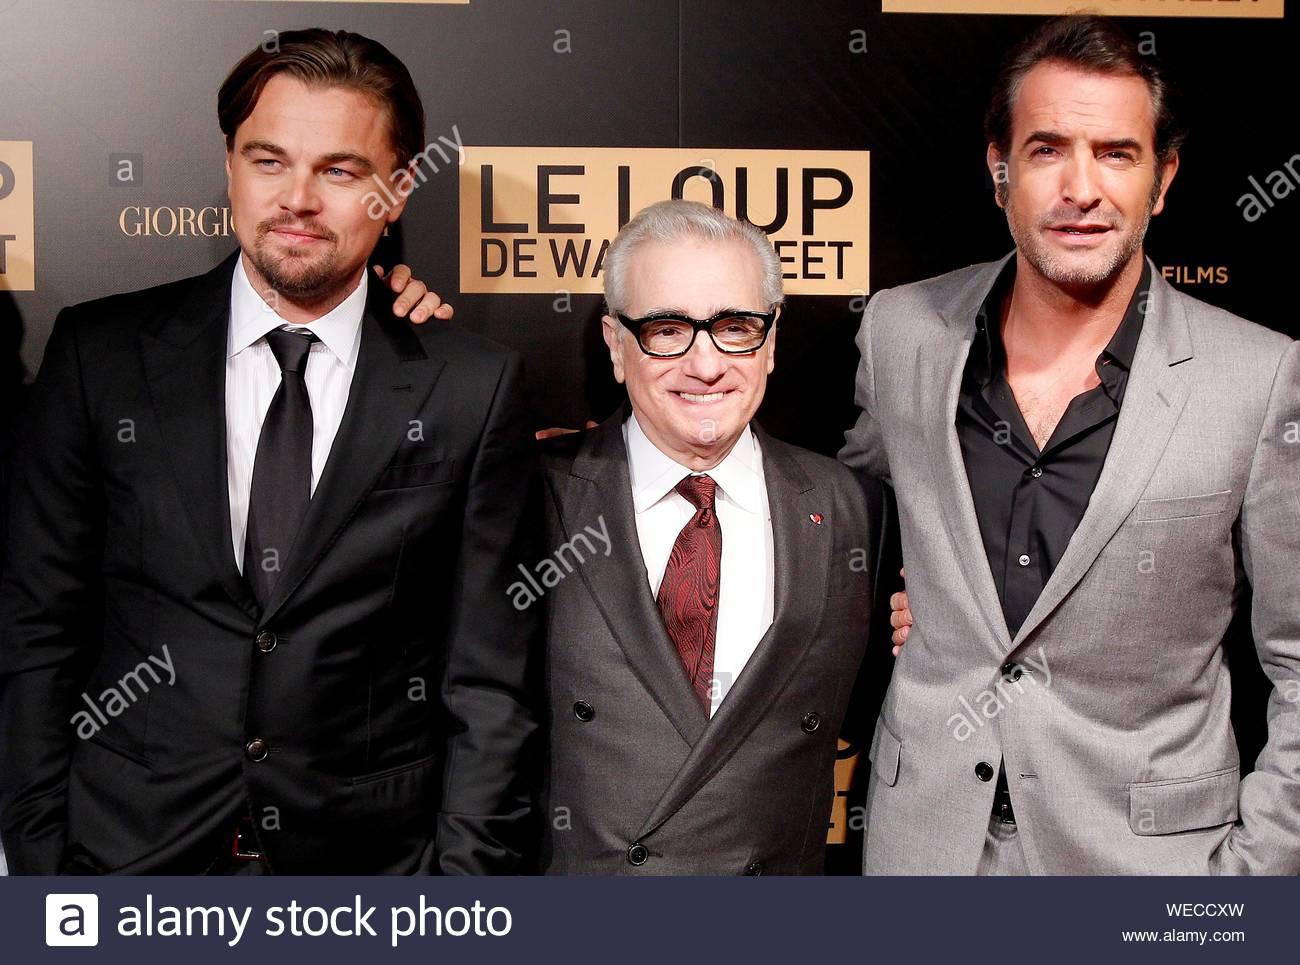 ¿Cuánto mide Jean Dujardin? Paris-france-leonardo-dicaprio-martin-scorsese-and-jean-dujardin-at-the-wolf-of-wall-street-premiere-at-the-cinema-gaumont-opera-in-paris-akm-gsi-december-9-2013-WECCXW